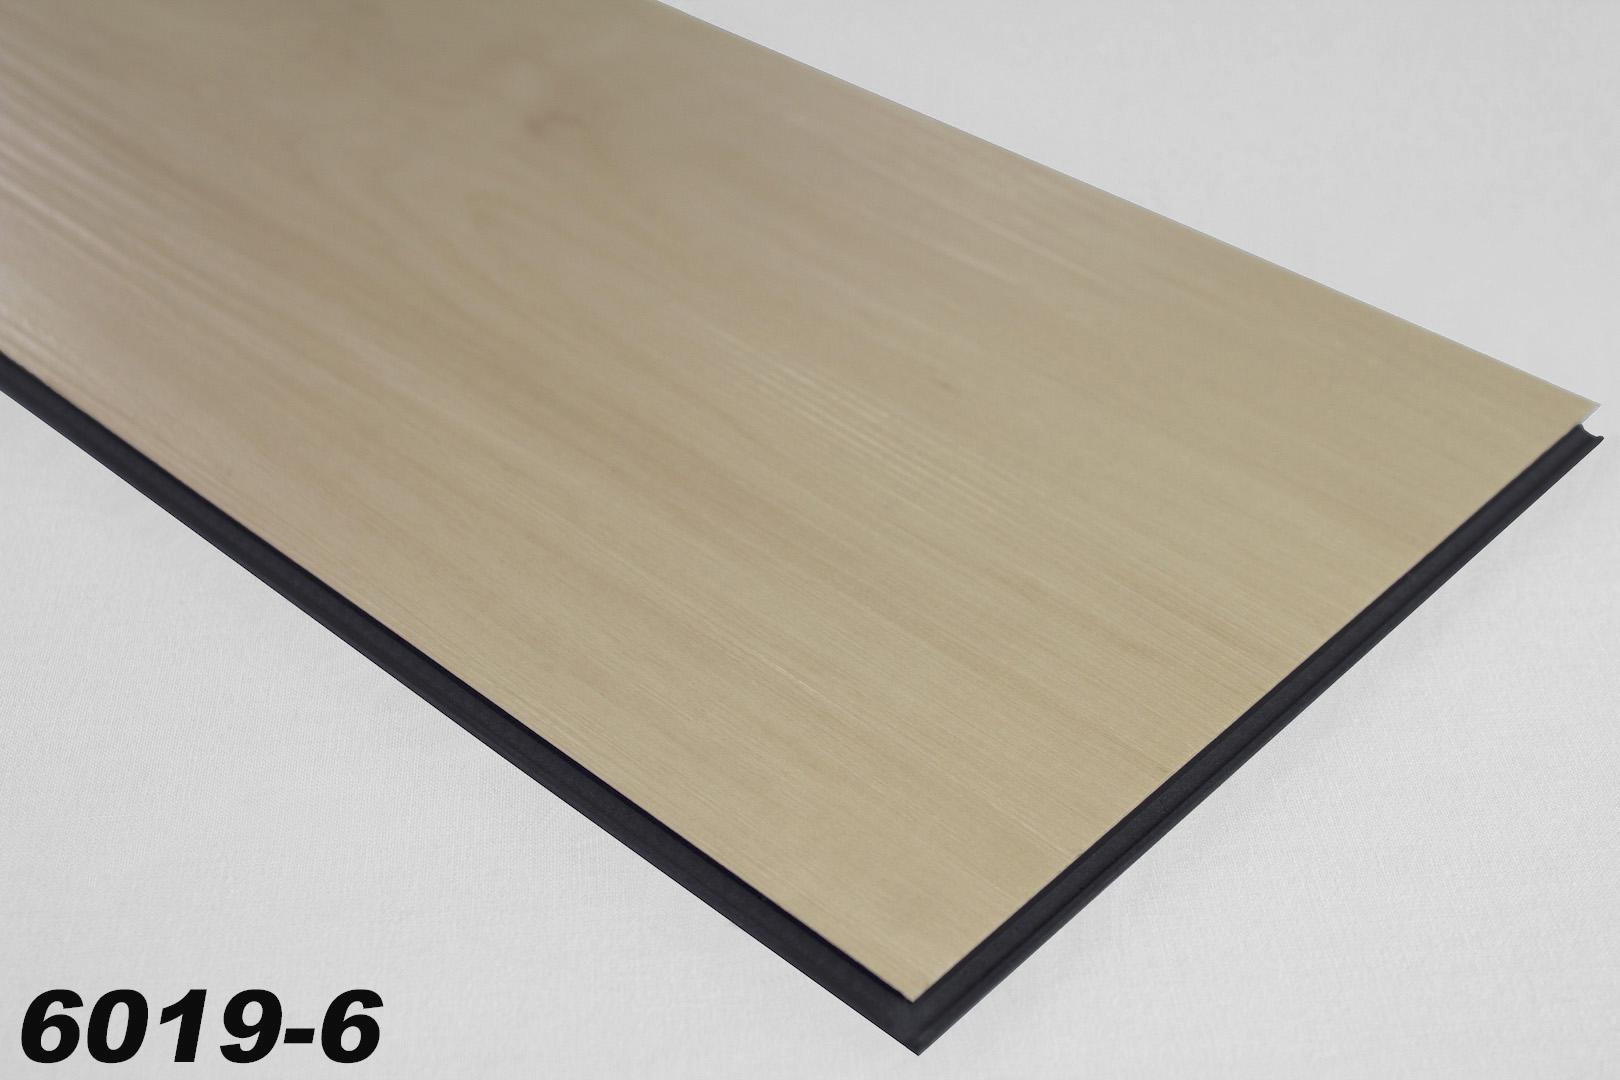 29,68 m² Vinylboden in 4,2mm Uniclic PVC-Bodenbelag Nutzschicht 0,3mm, 6019-6